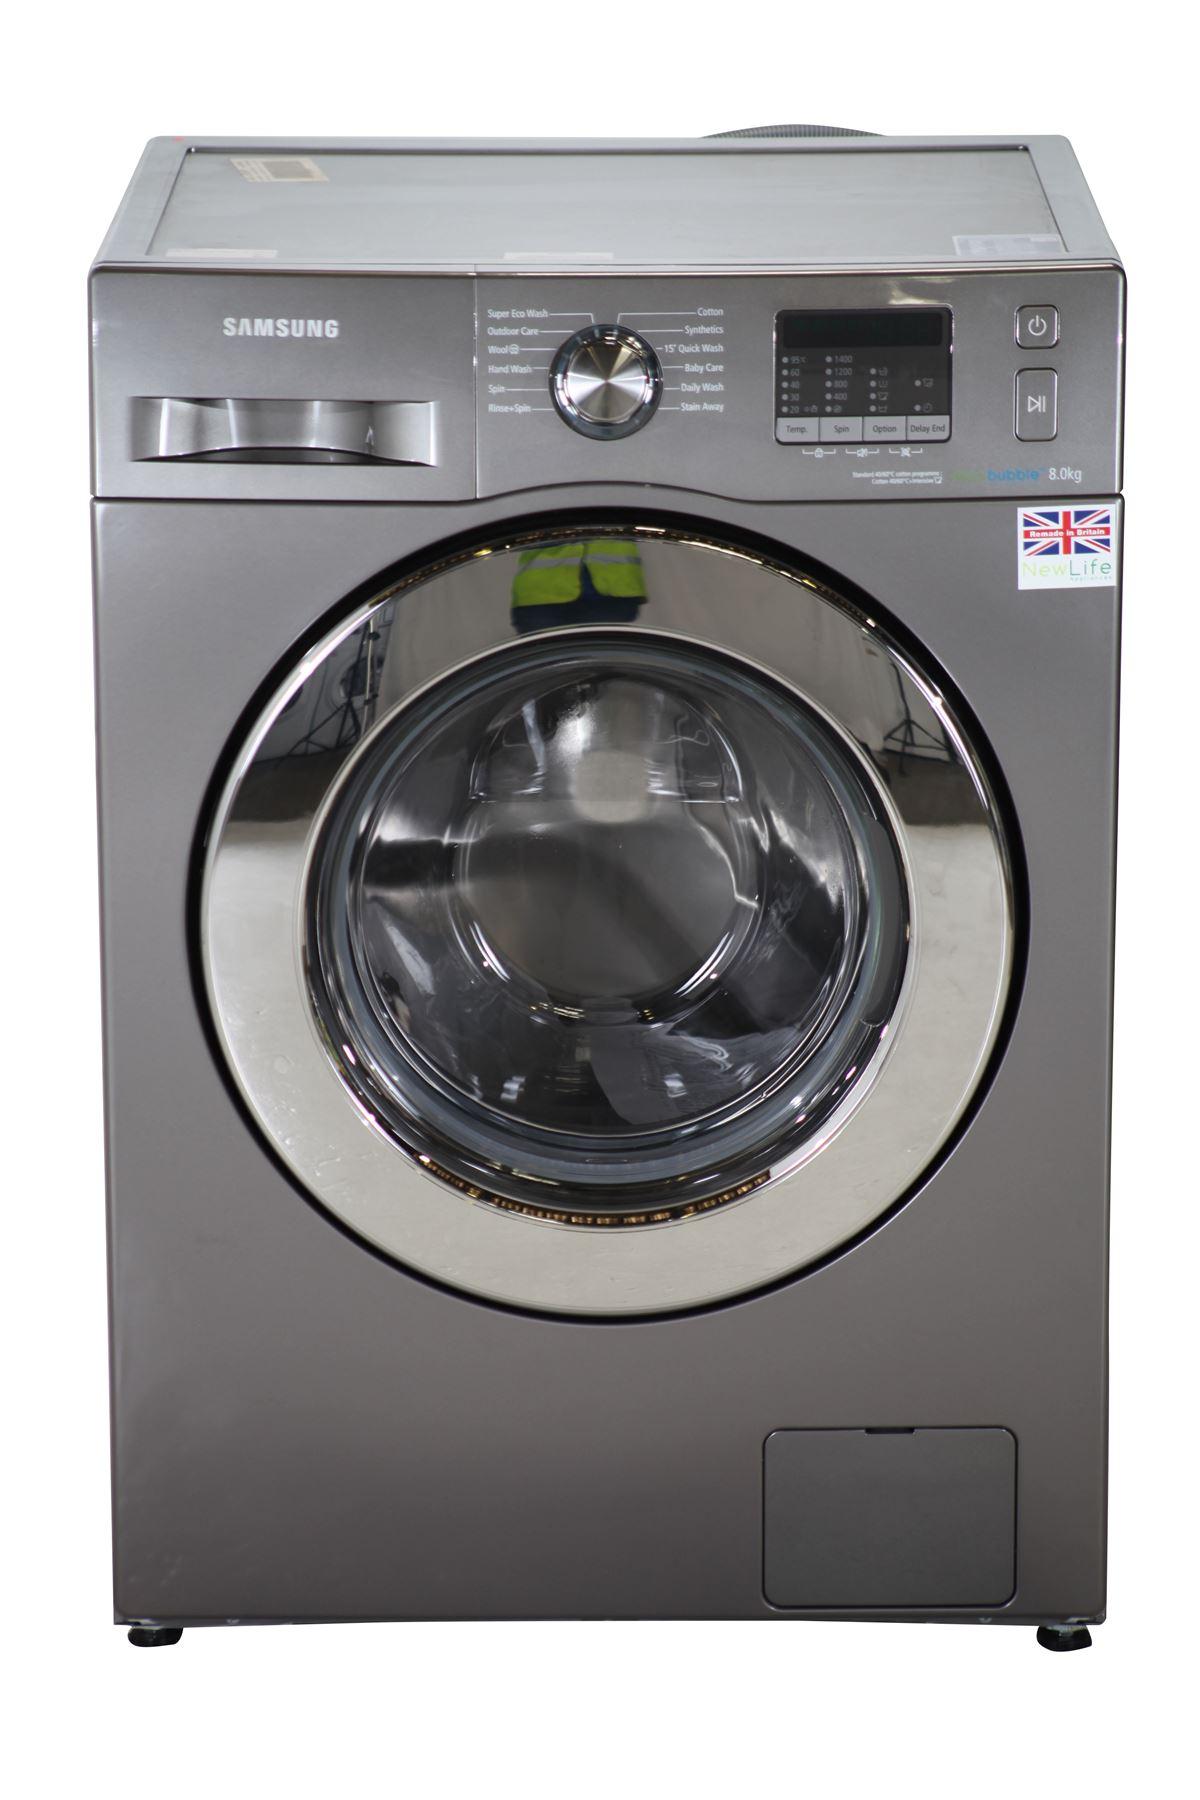 k 564151 samsung 8kg ecobubble washing machine wf80f5e2w4x silver. Black Bedroom Furniture Sets. Home Design Ideas